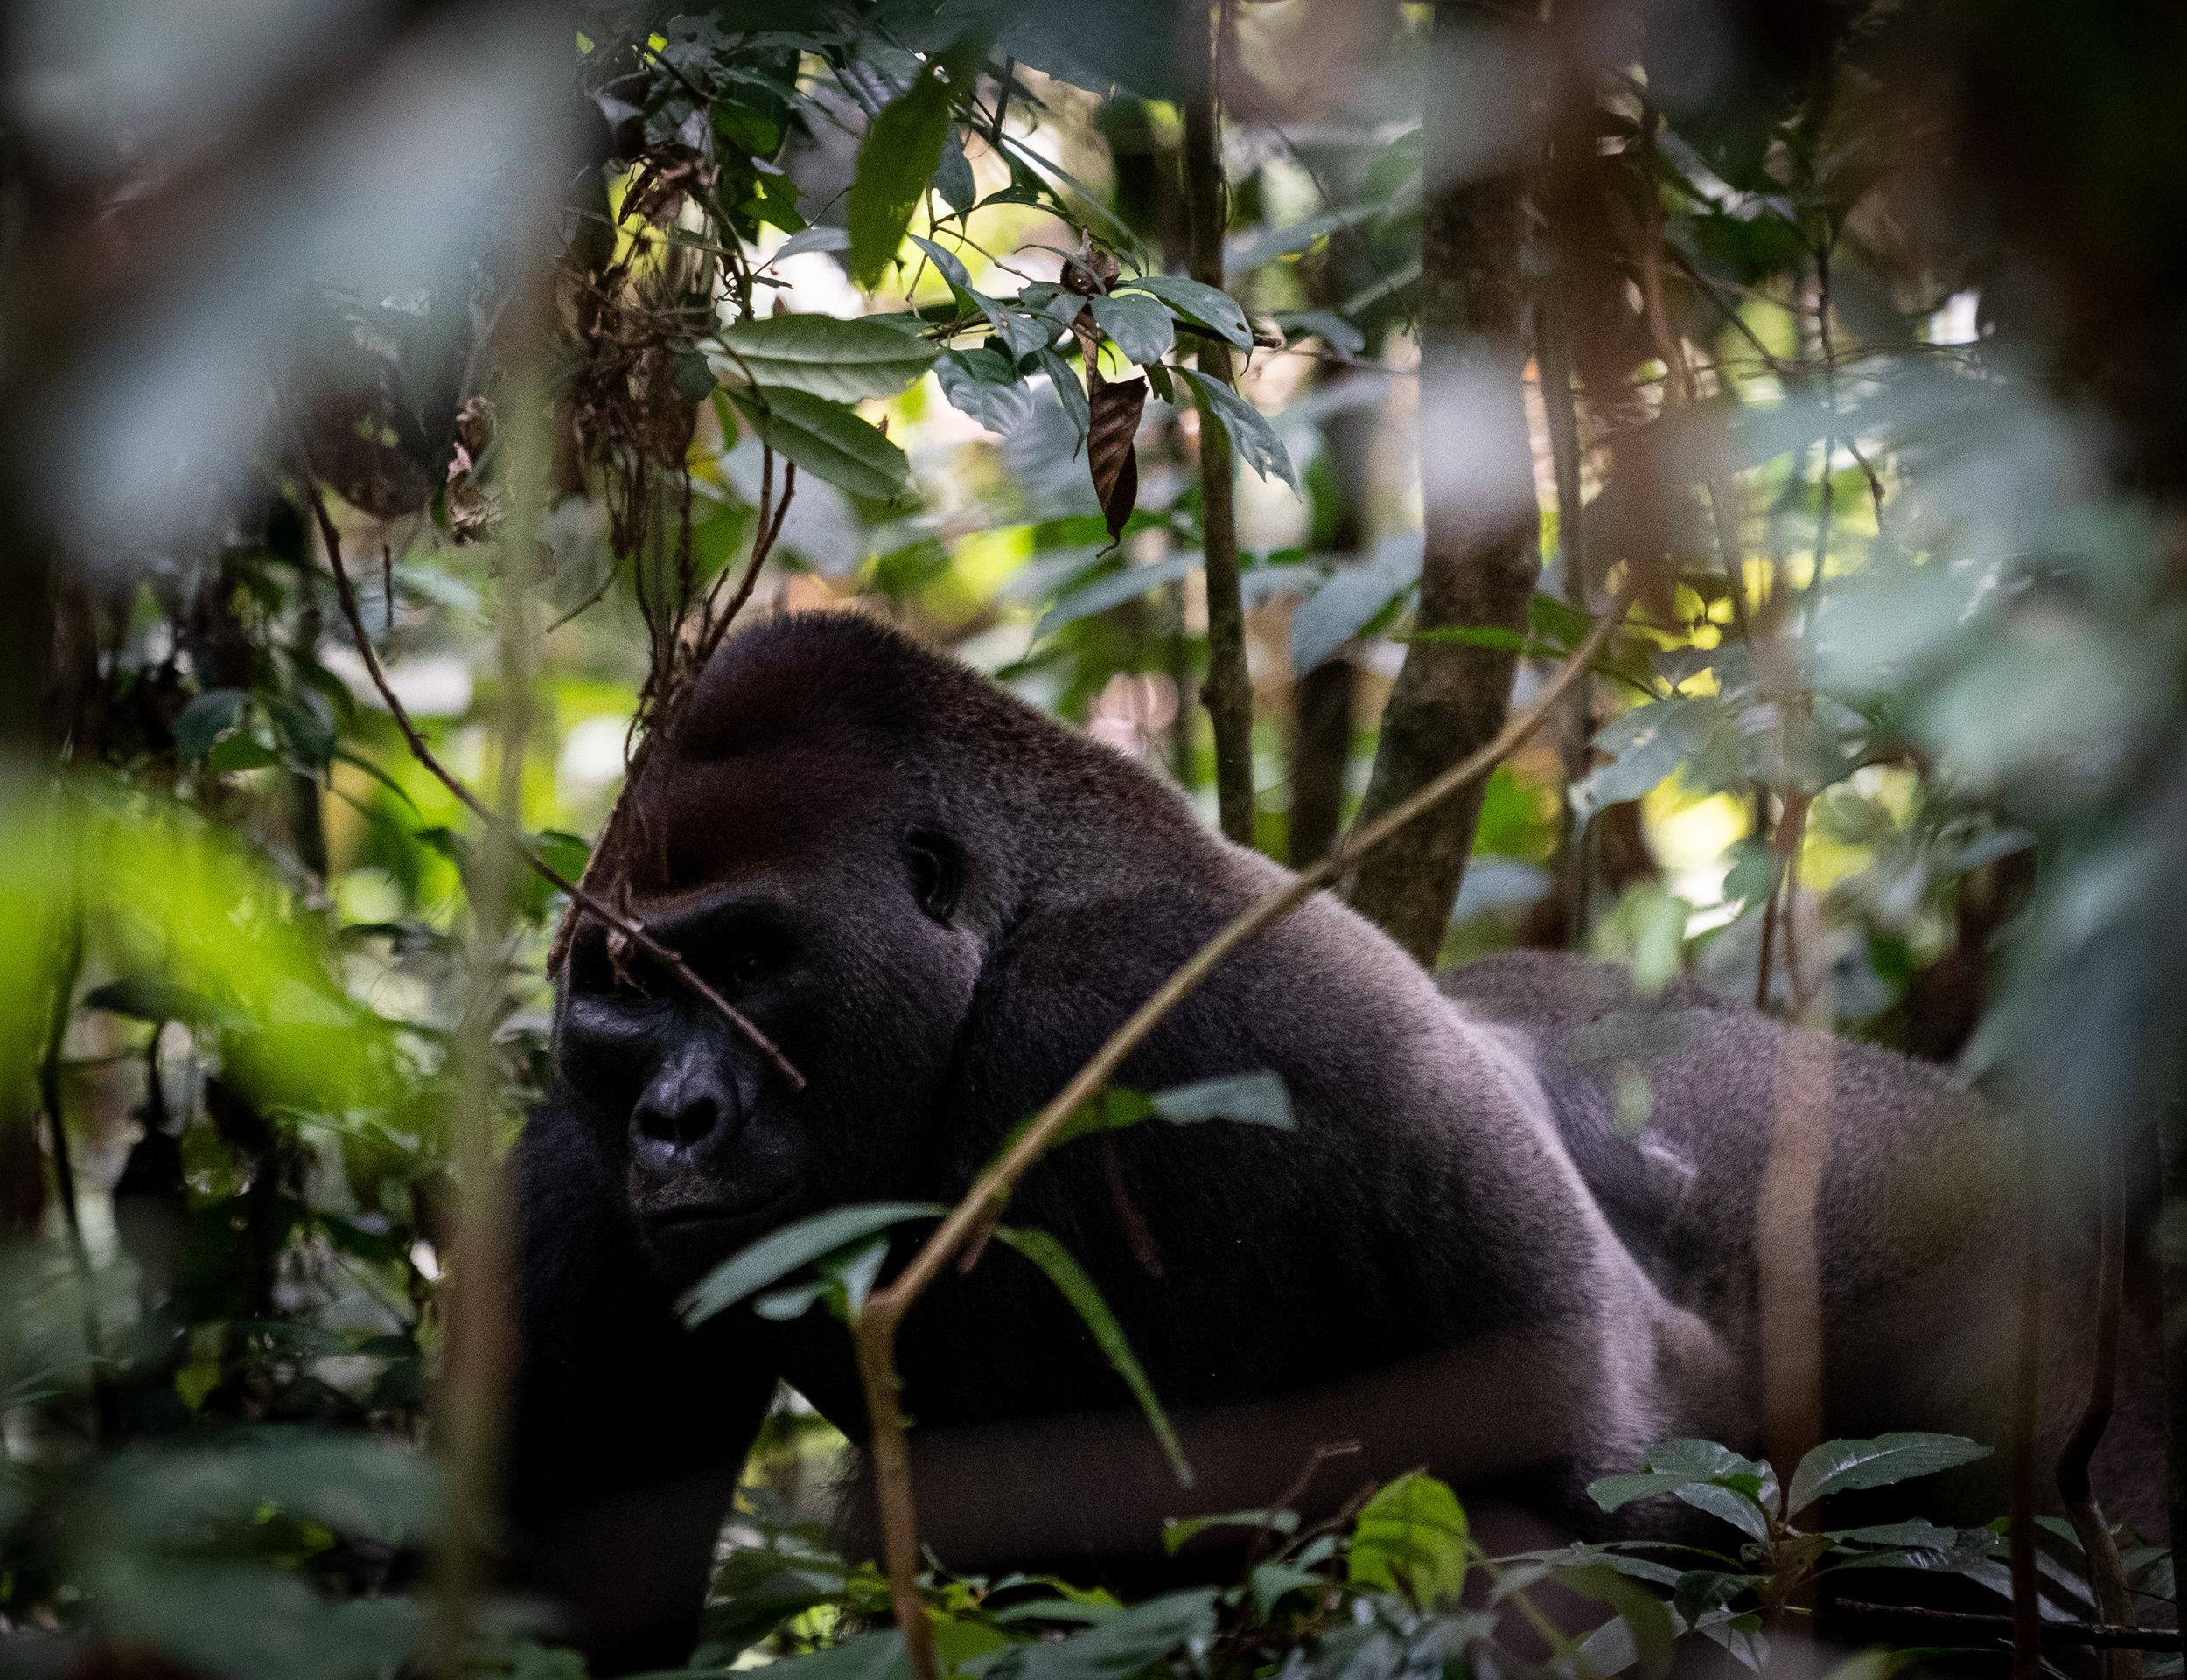 Abeke the Silverback Western Lowland Gorilla